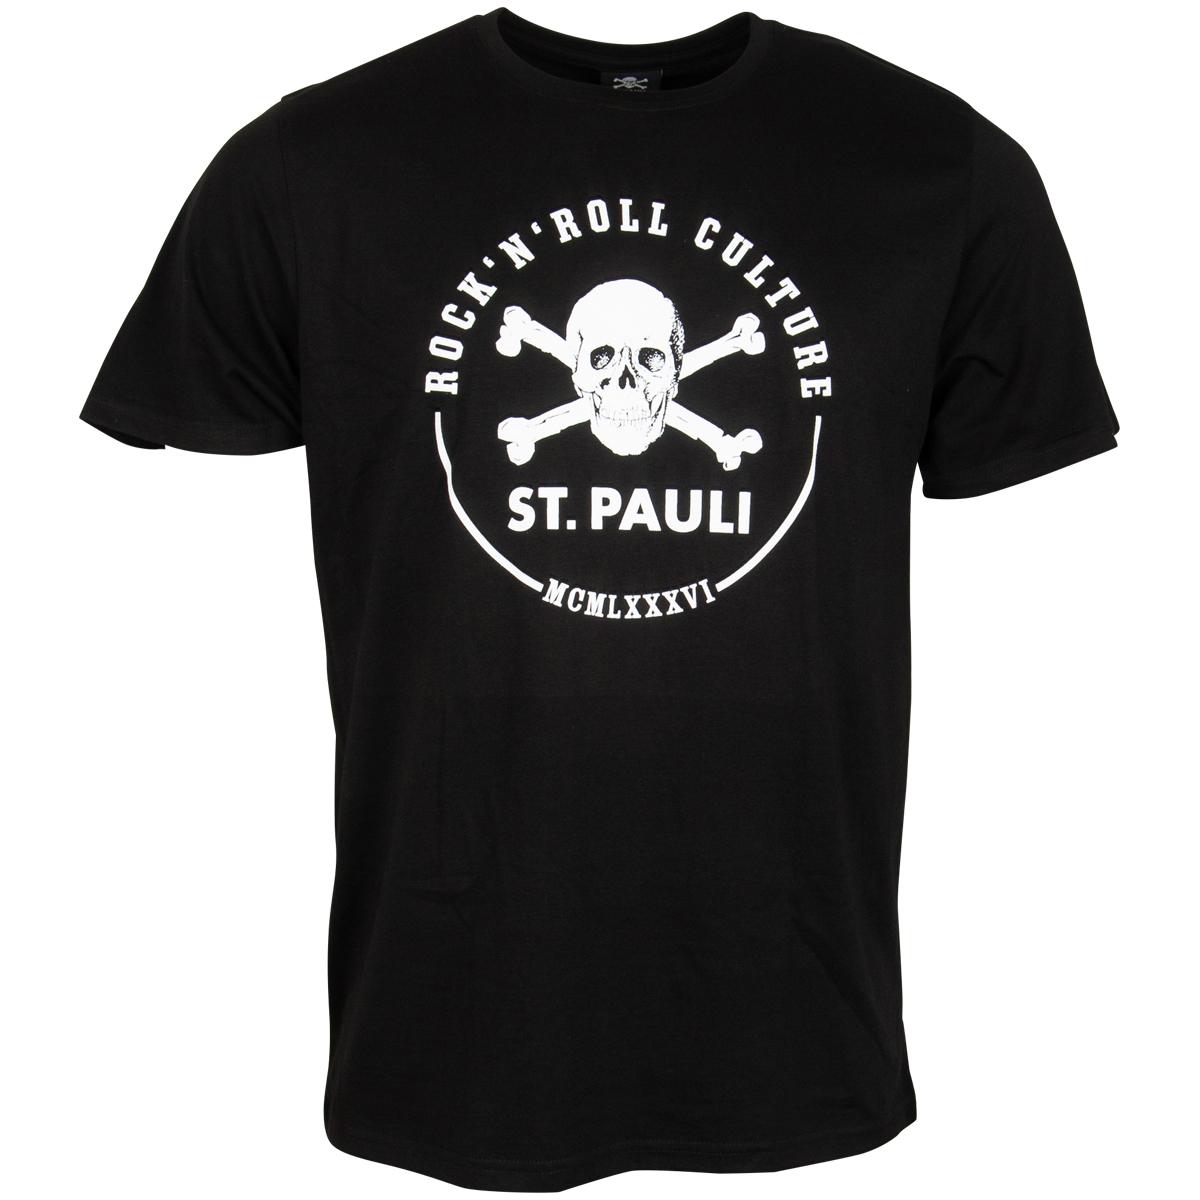 FC St. Pauli - T-Shirt RnR ´86 - schwarz